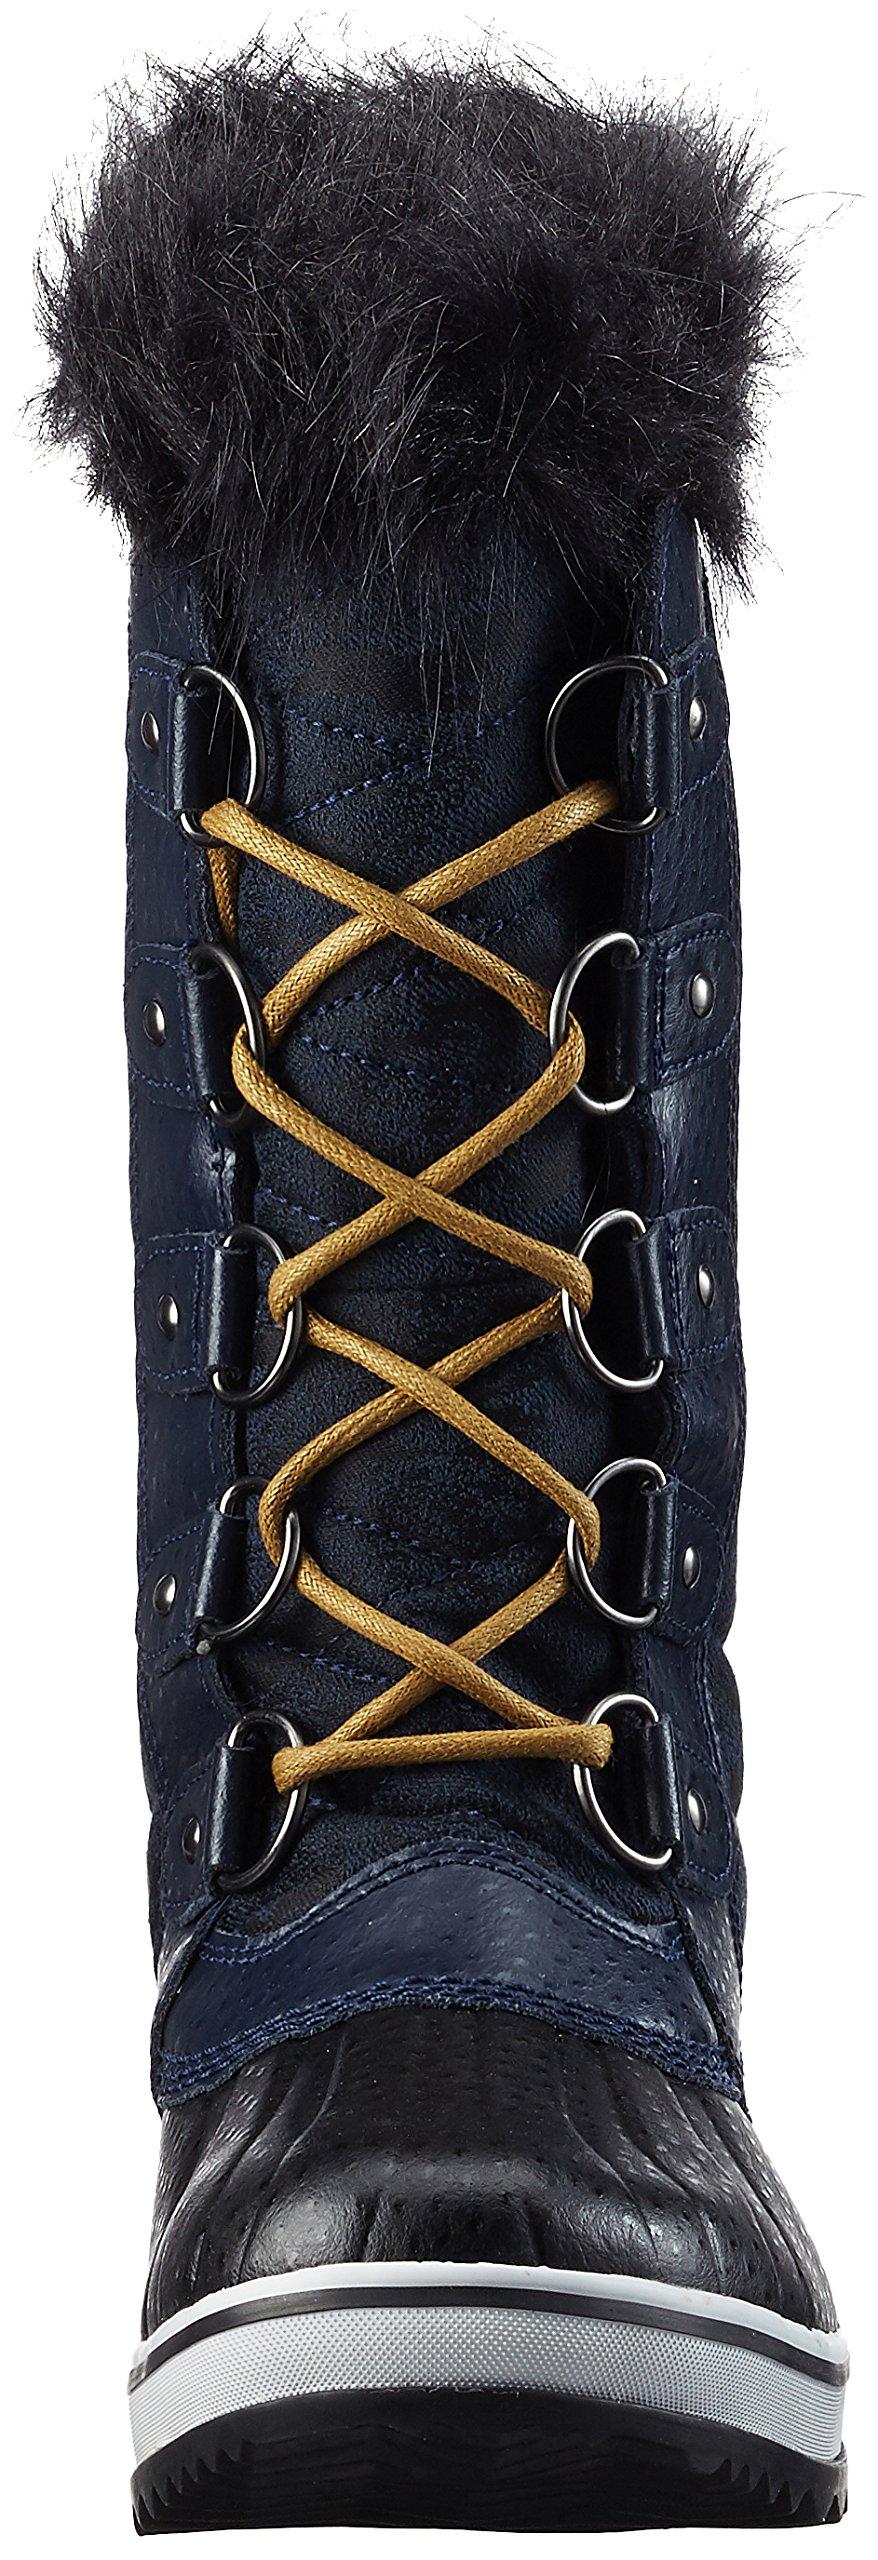 SOREL Women's 10.25 in. Tofino II Waterproof Boots, Collegiate Navy/Glare Blue 9 by SOREL (Image #4)